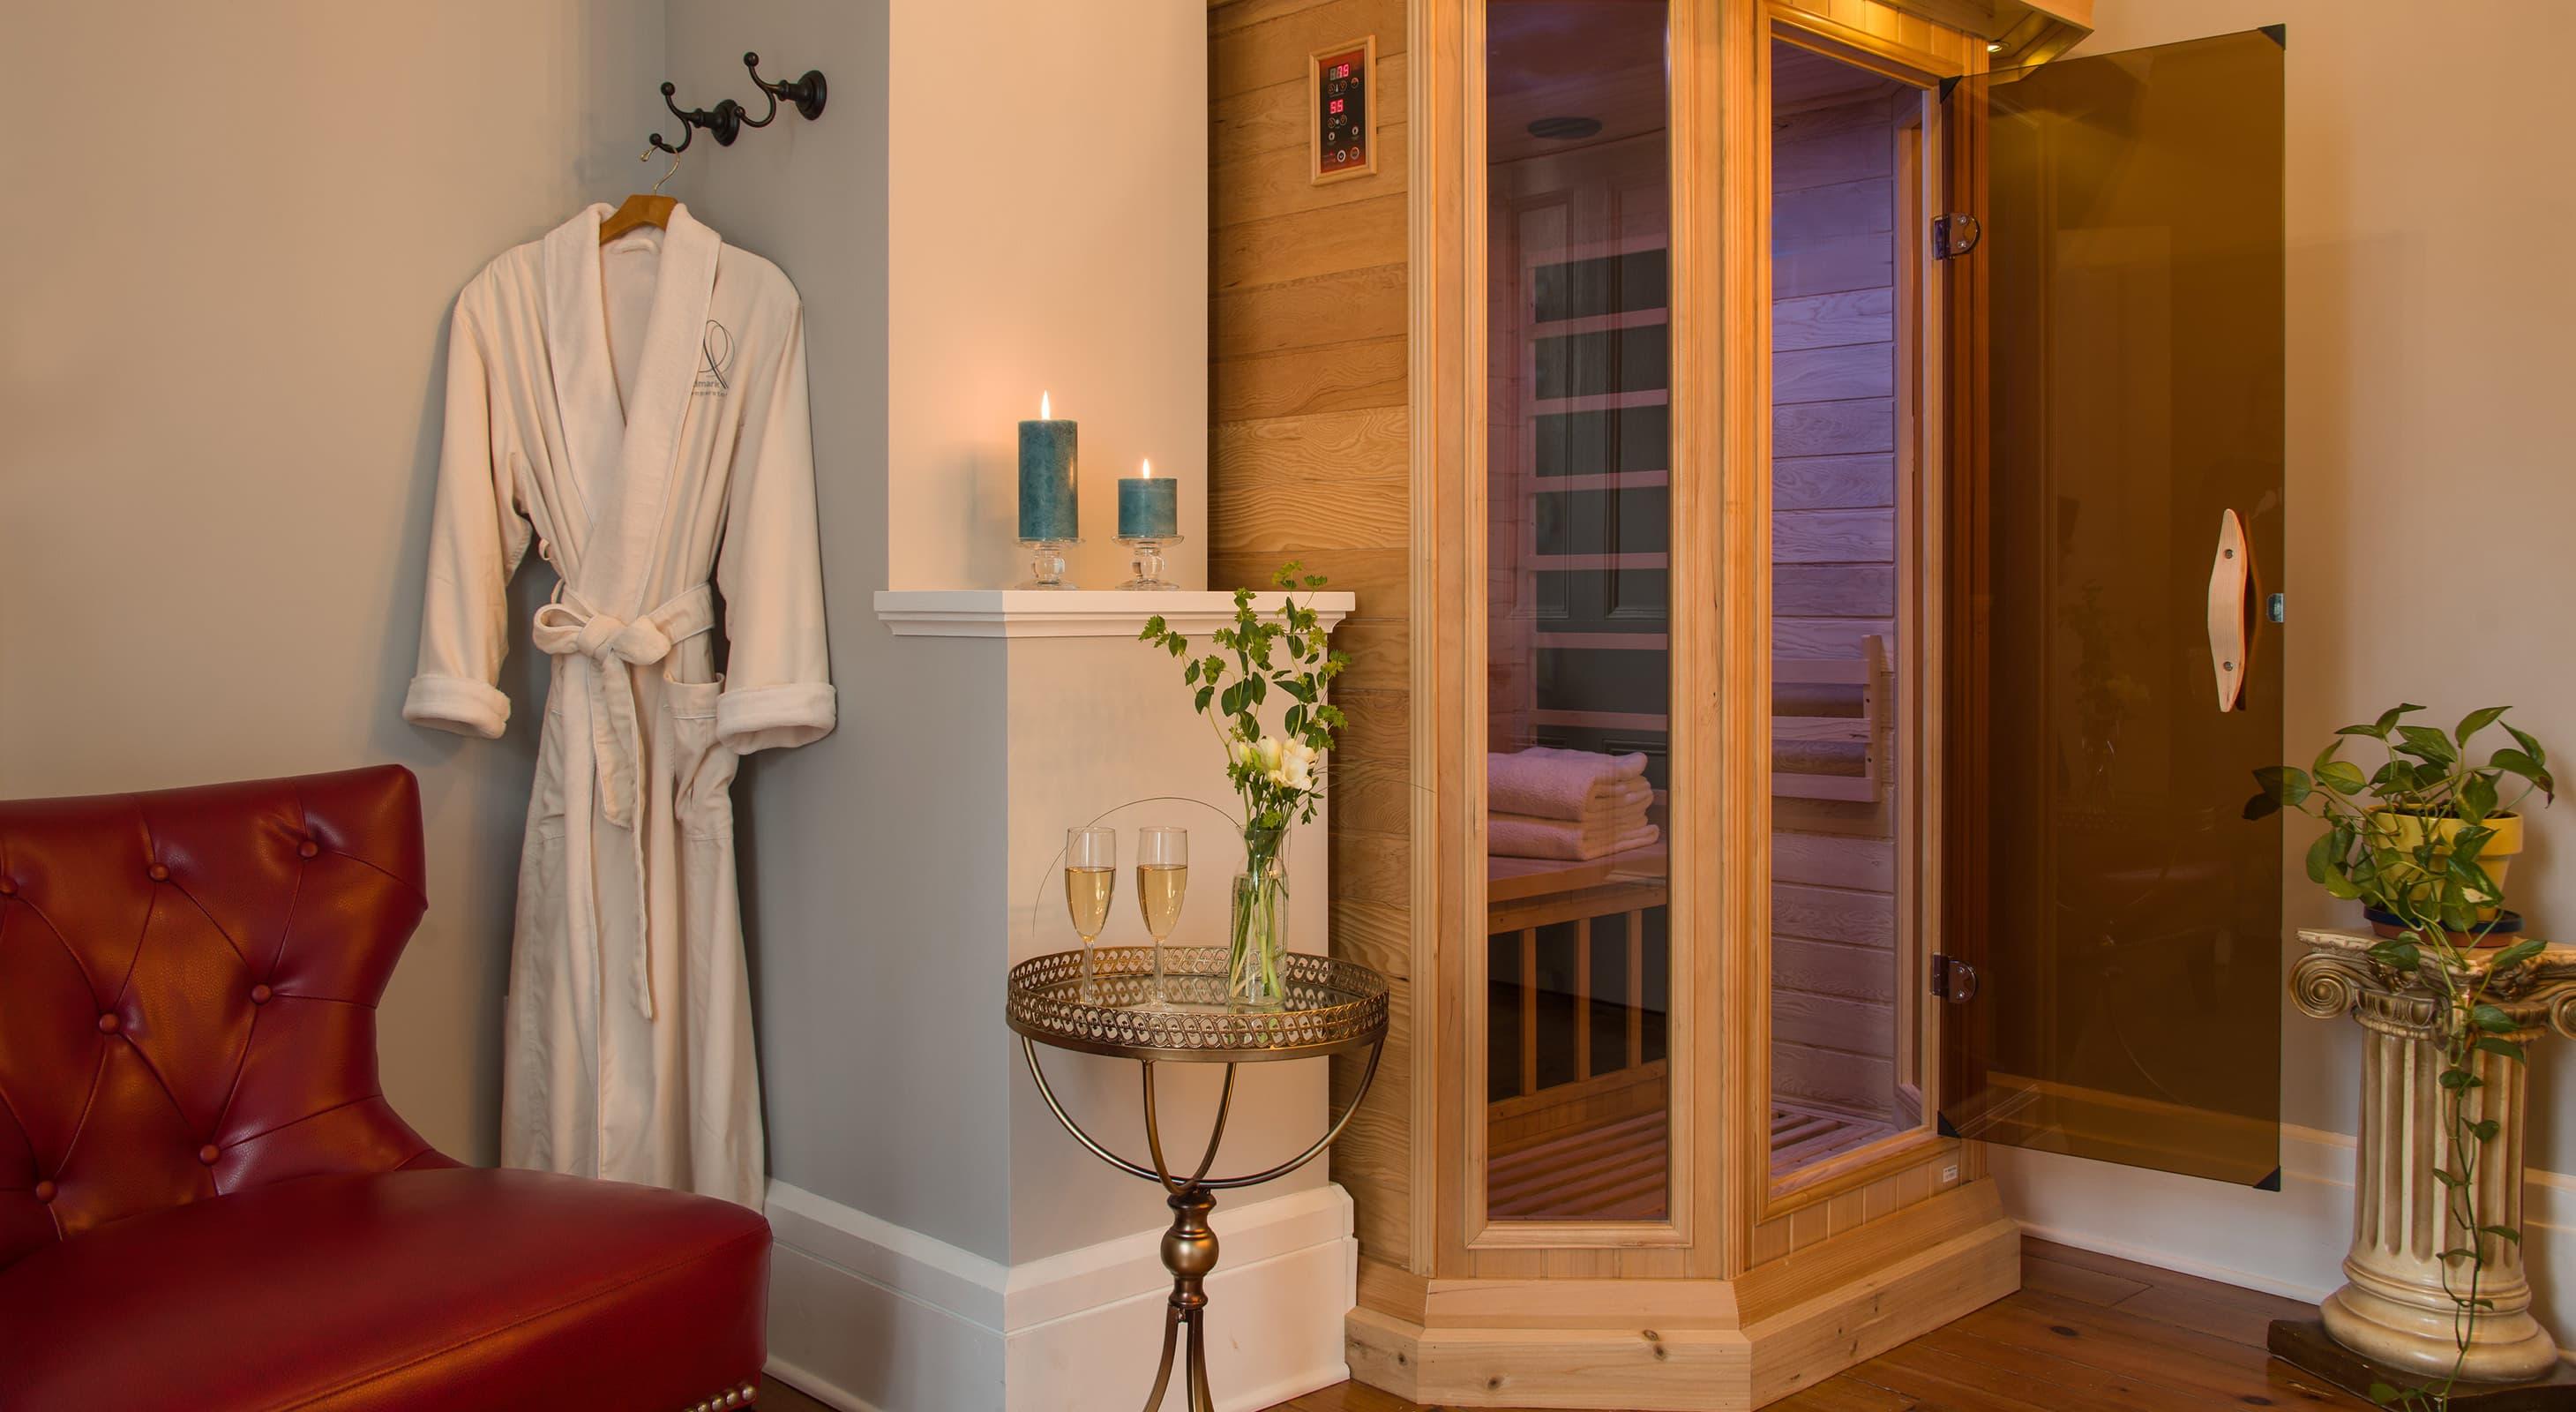 romantic room for a honeymoon